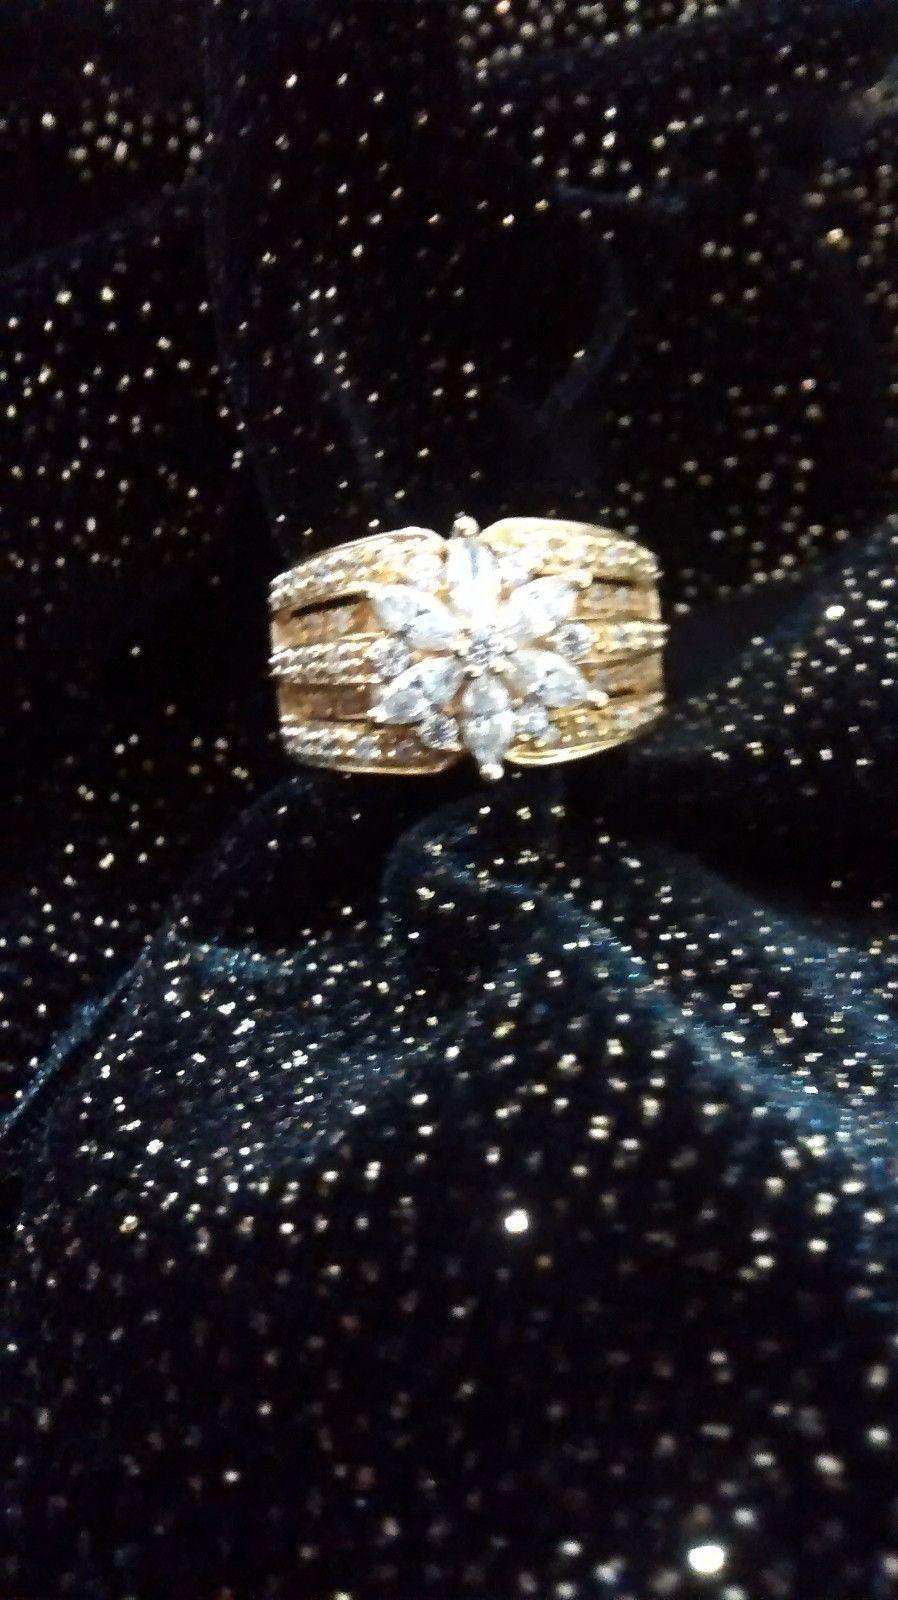 14K SOLID YELLOW GOLD DIAMONIQUE CZ 1 35 CT LISA MASON